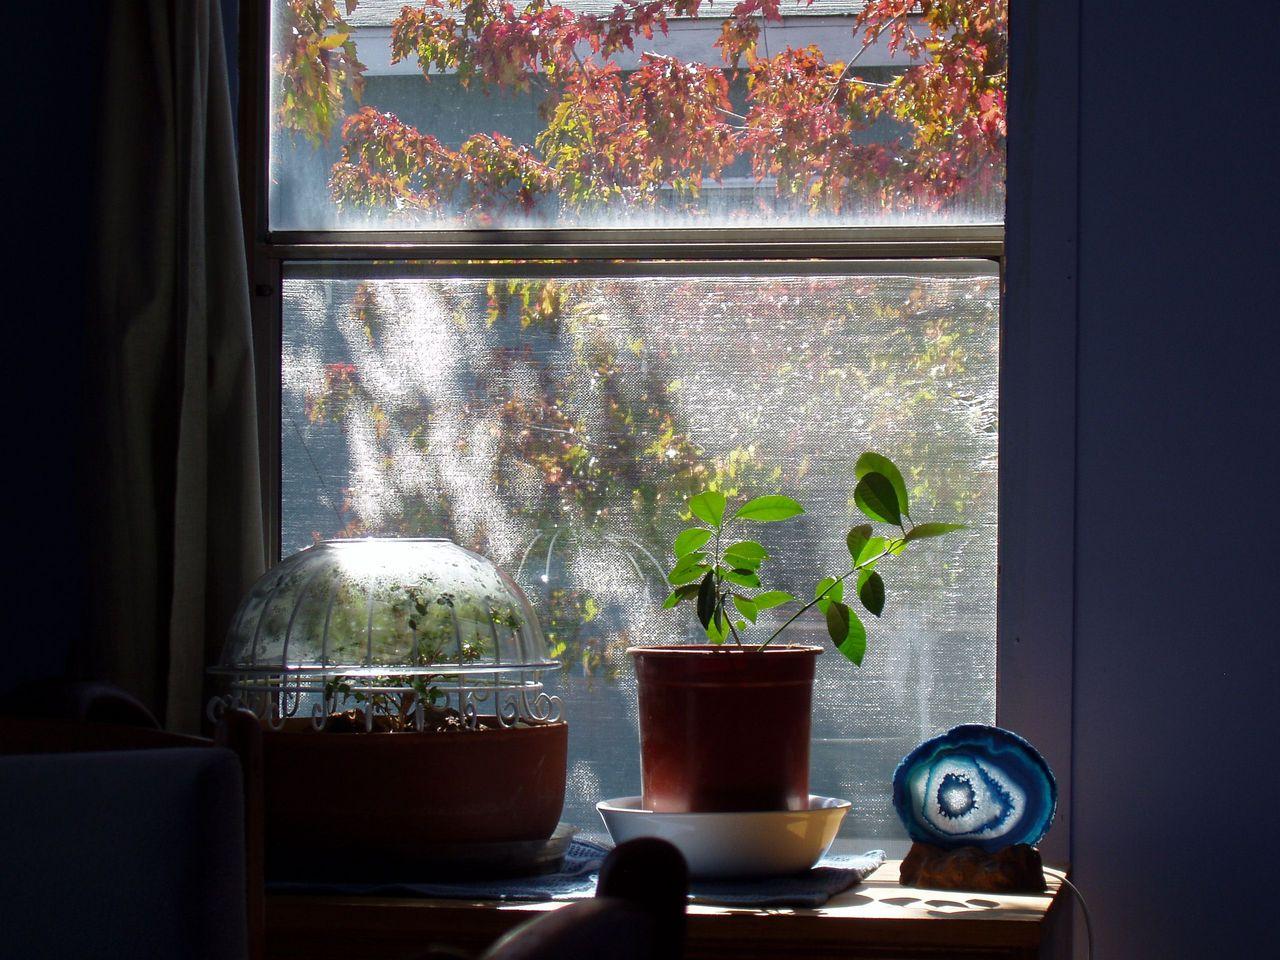 2560x1920 image for Sunlight windows